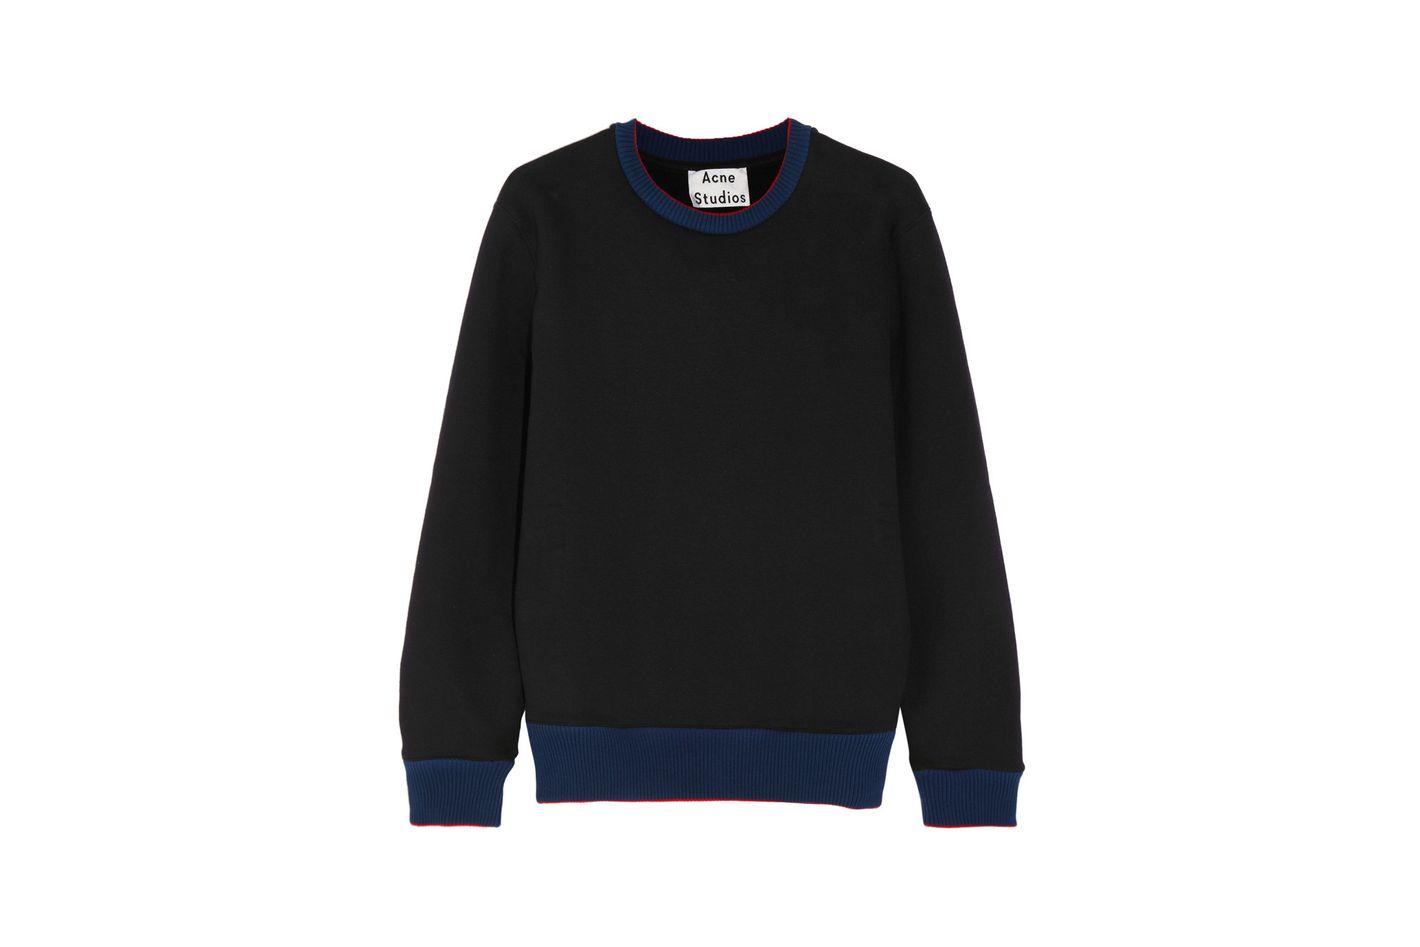 Acne Studios Carly cotton-jersey sweatshirt